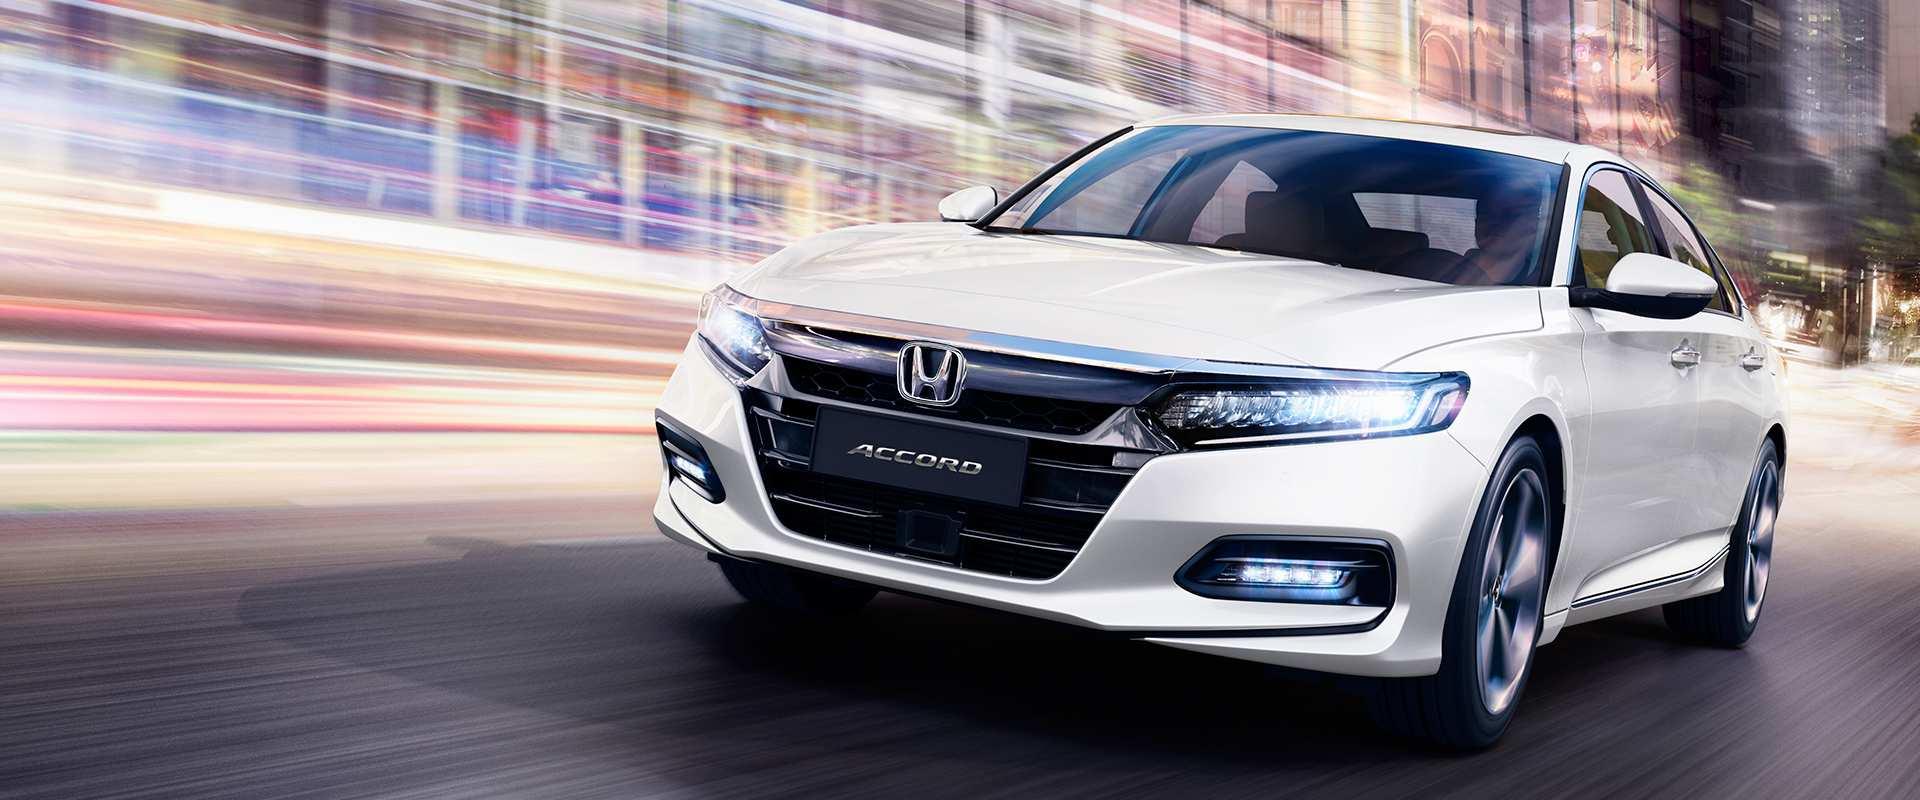 Honda Accord Touring - Modernidade